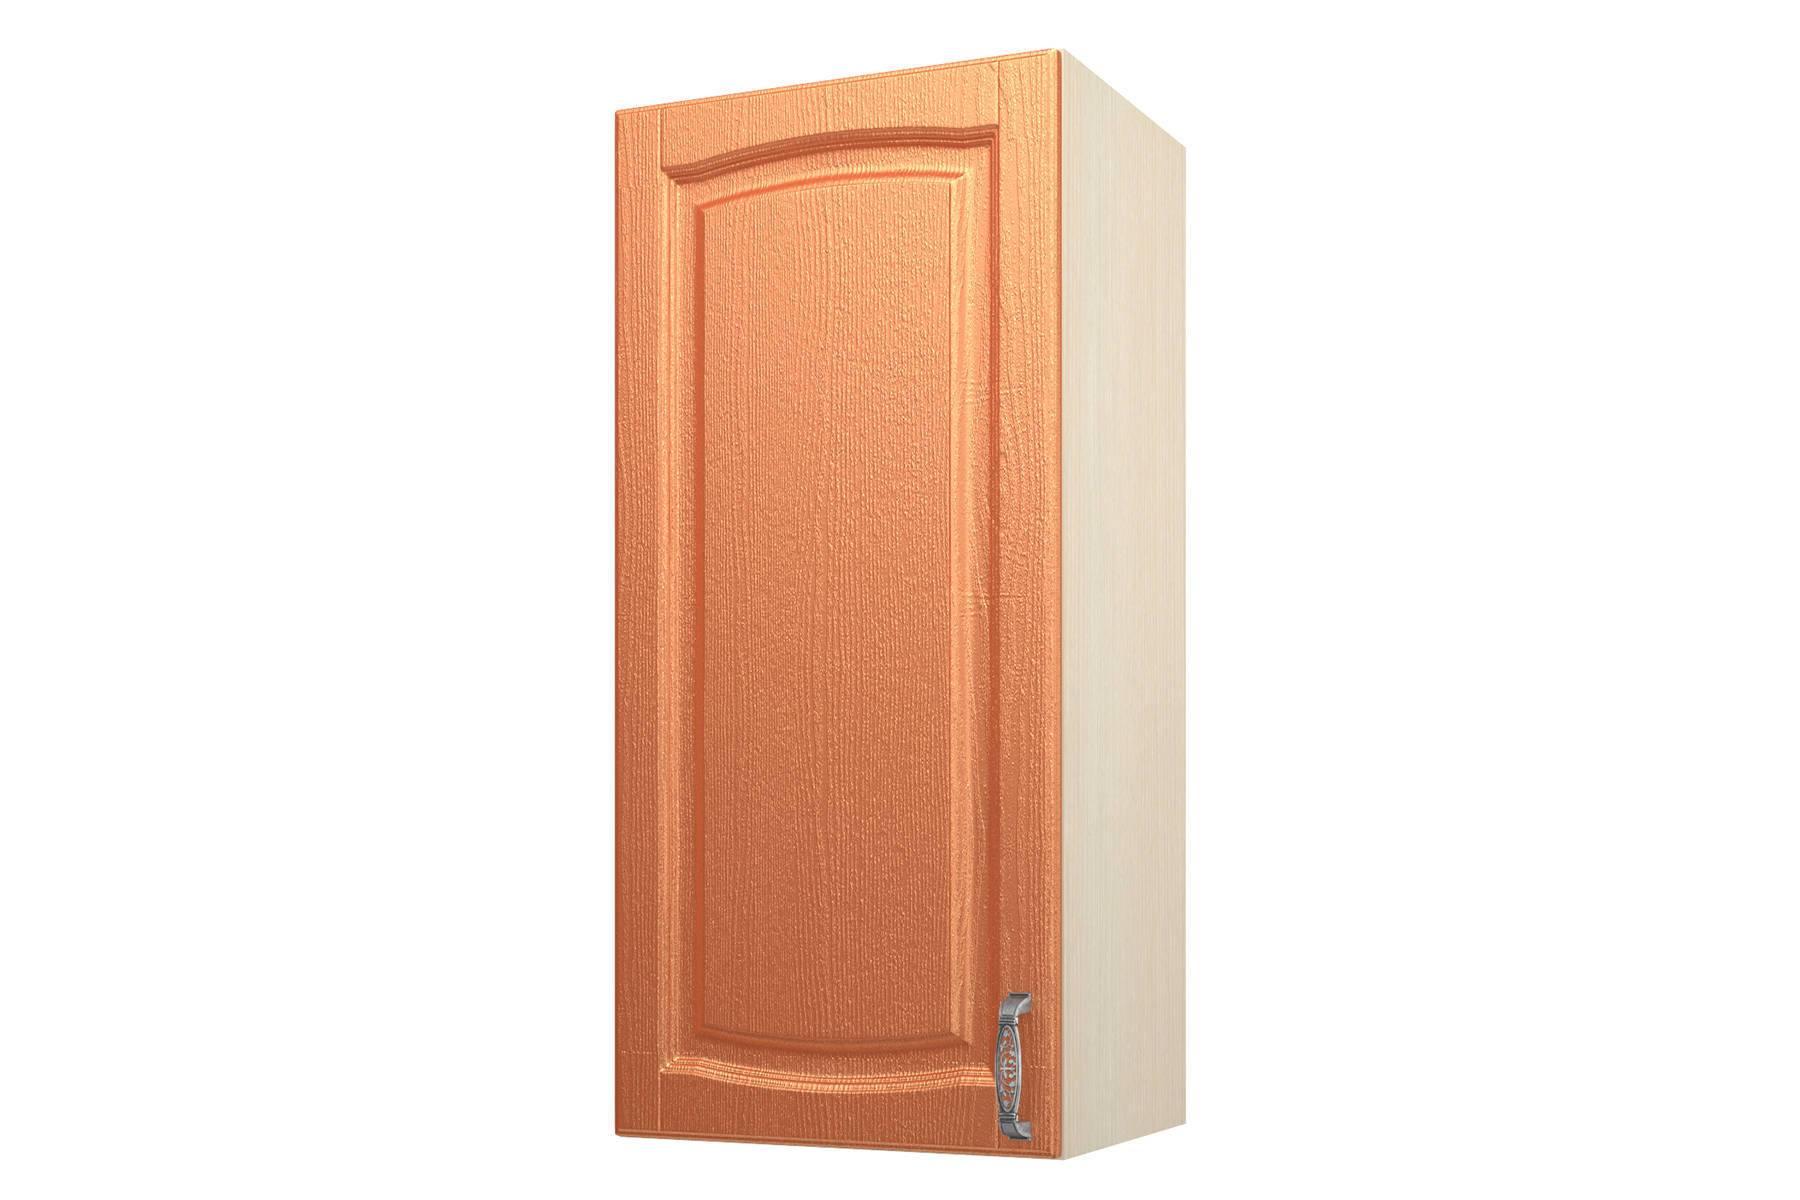 Равенна ART Шкаф-сушка 45 (Н-96), 1 дверь равенна art шкаф навесной 40 н 96 1 дверь